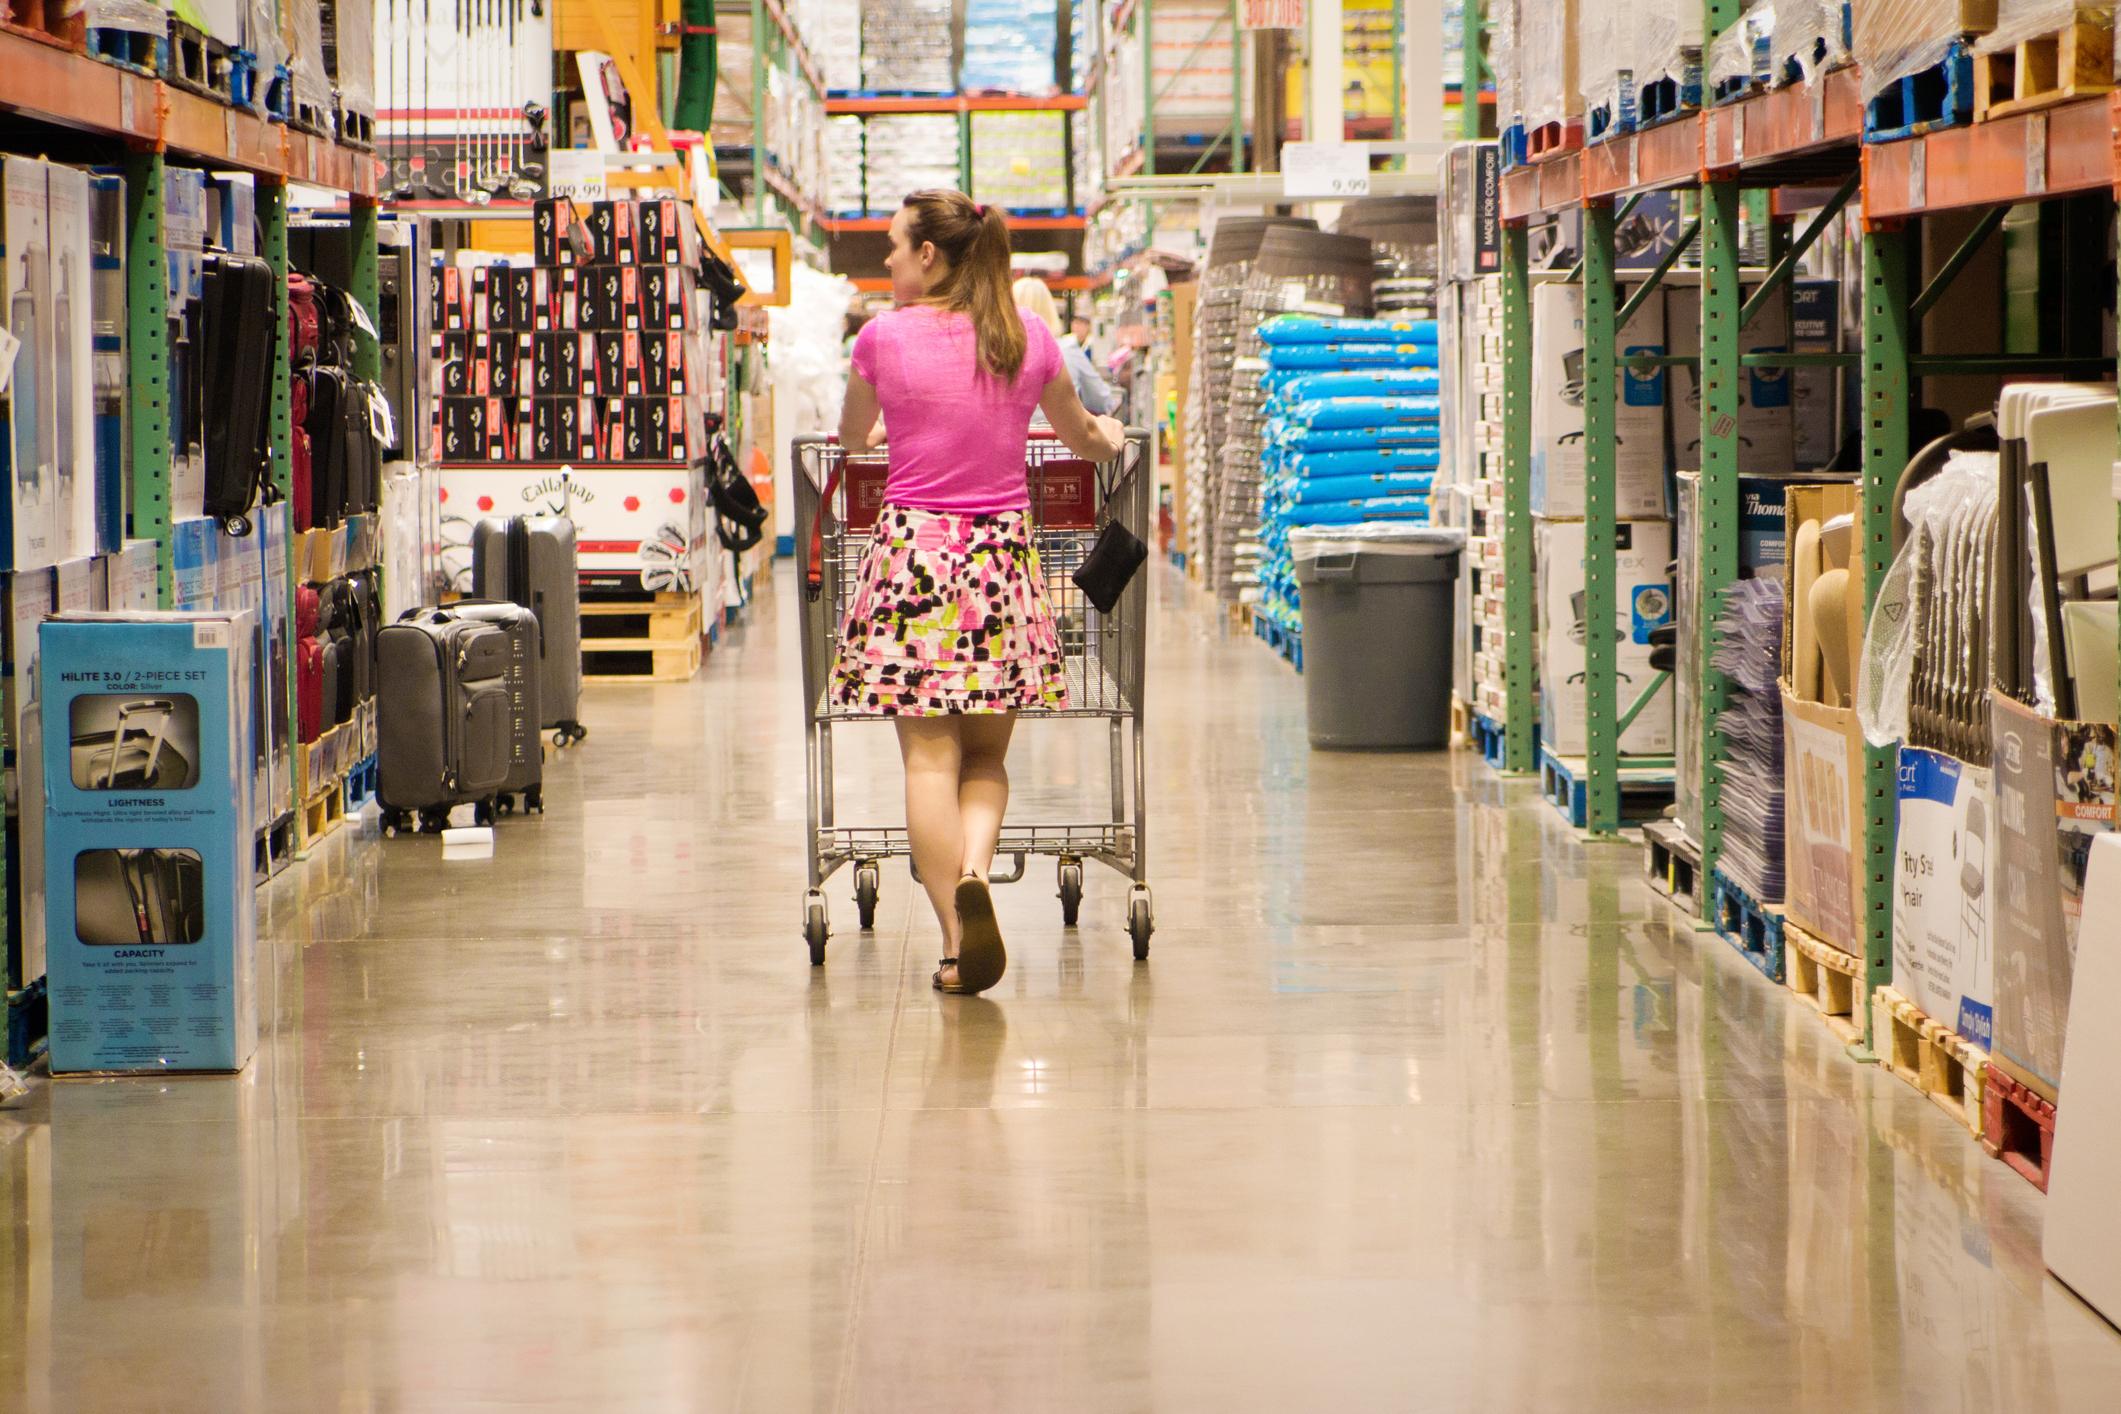 A customer browses the aisles at a warehouse club.